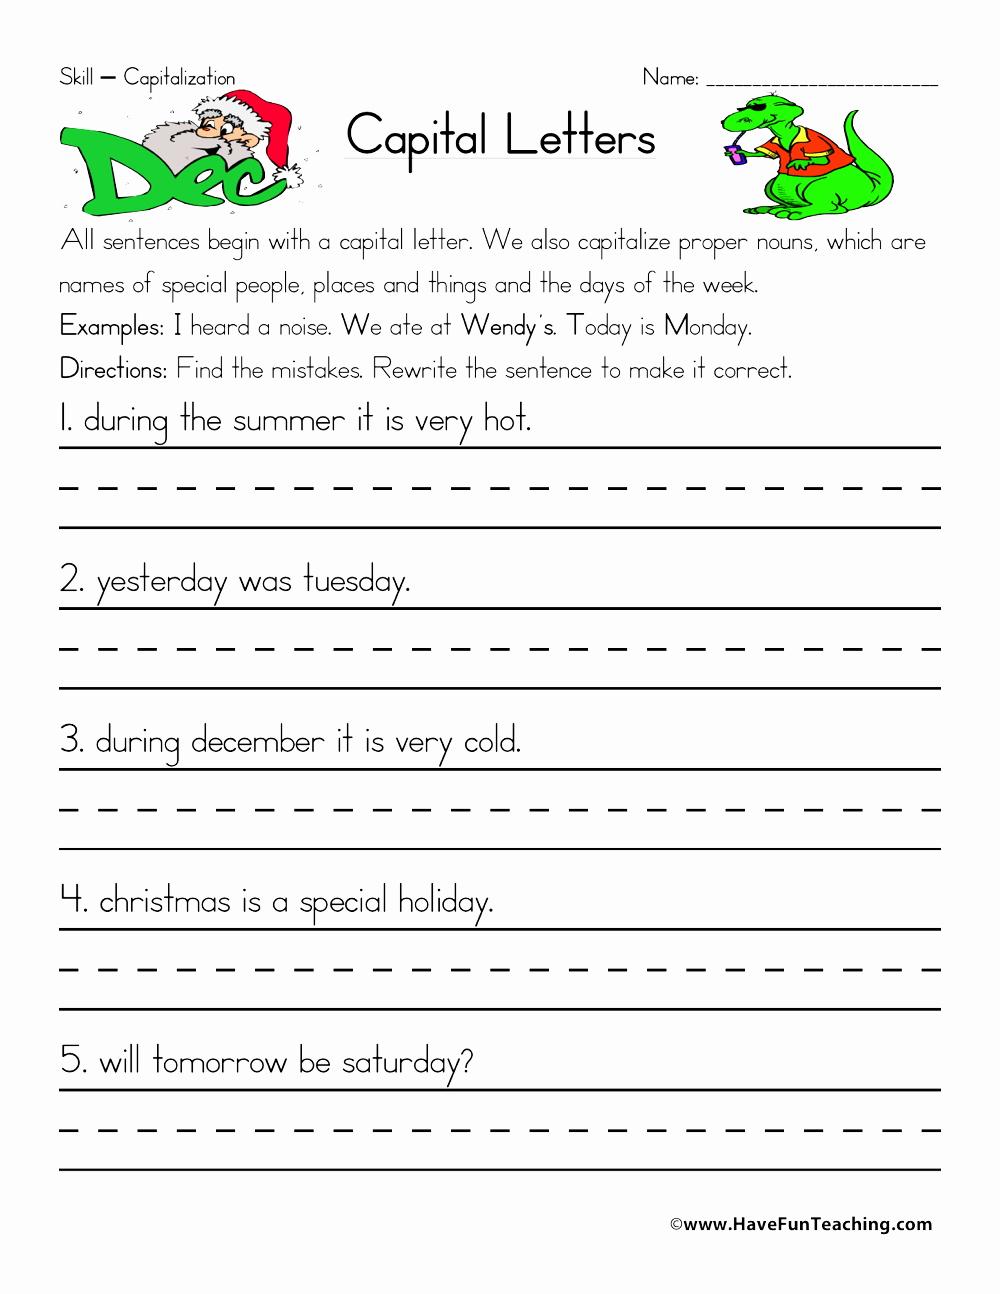 Printable Capitalization Worksheets Elegant Capitalization Worksheet Have Fun Teaching